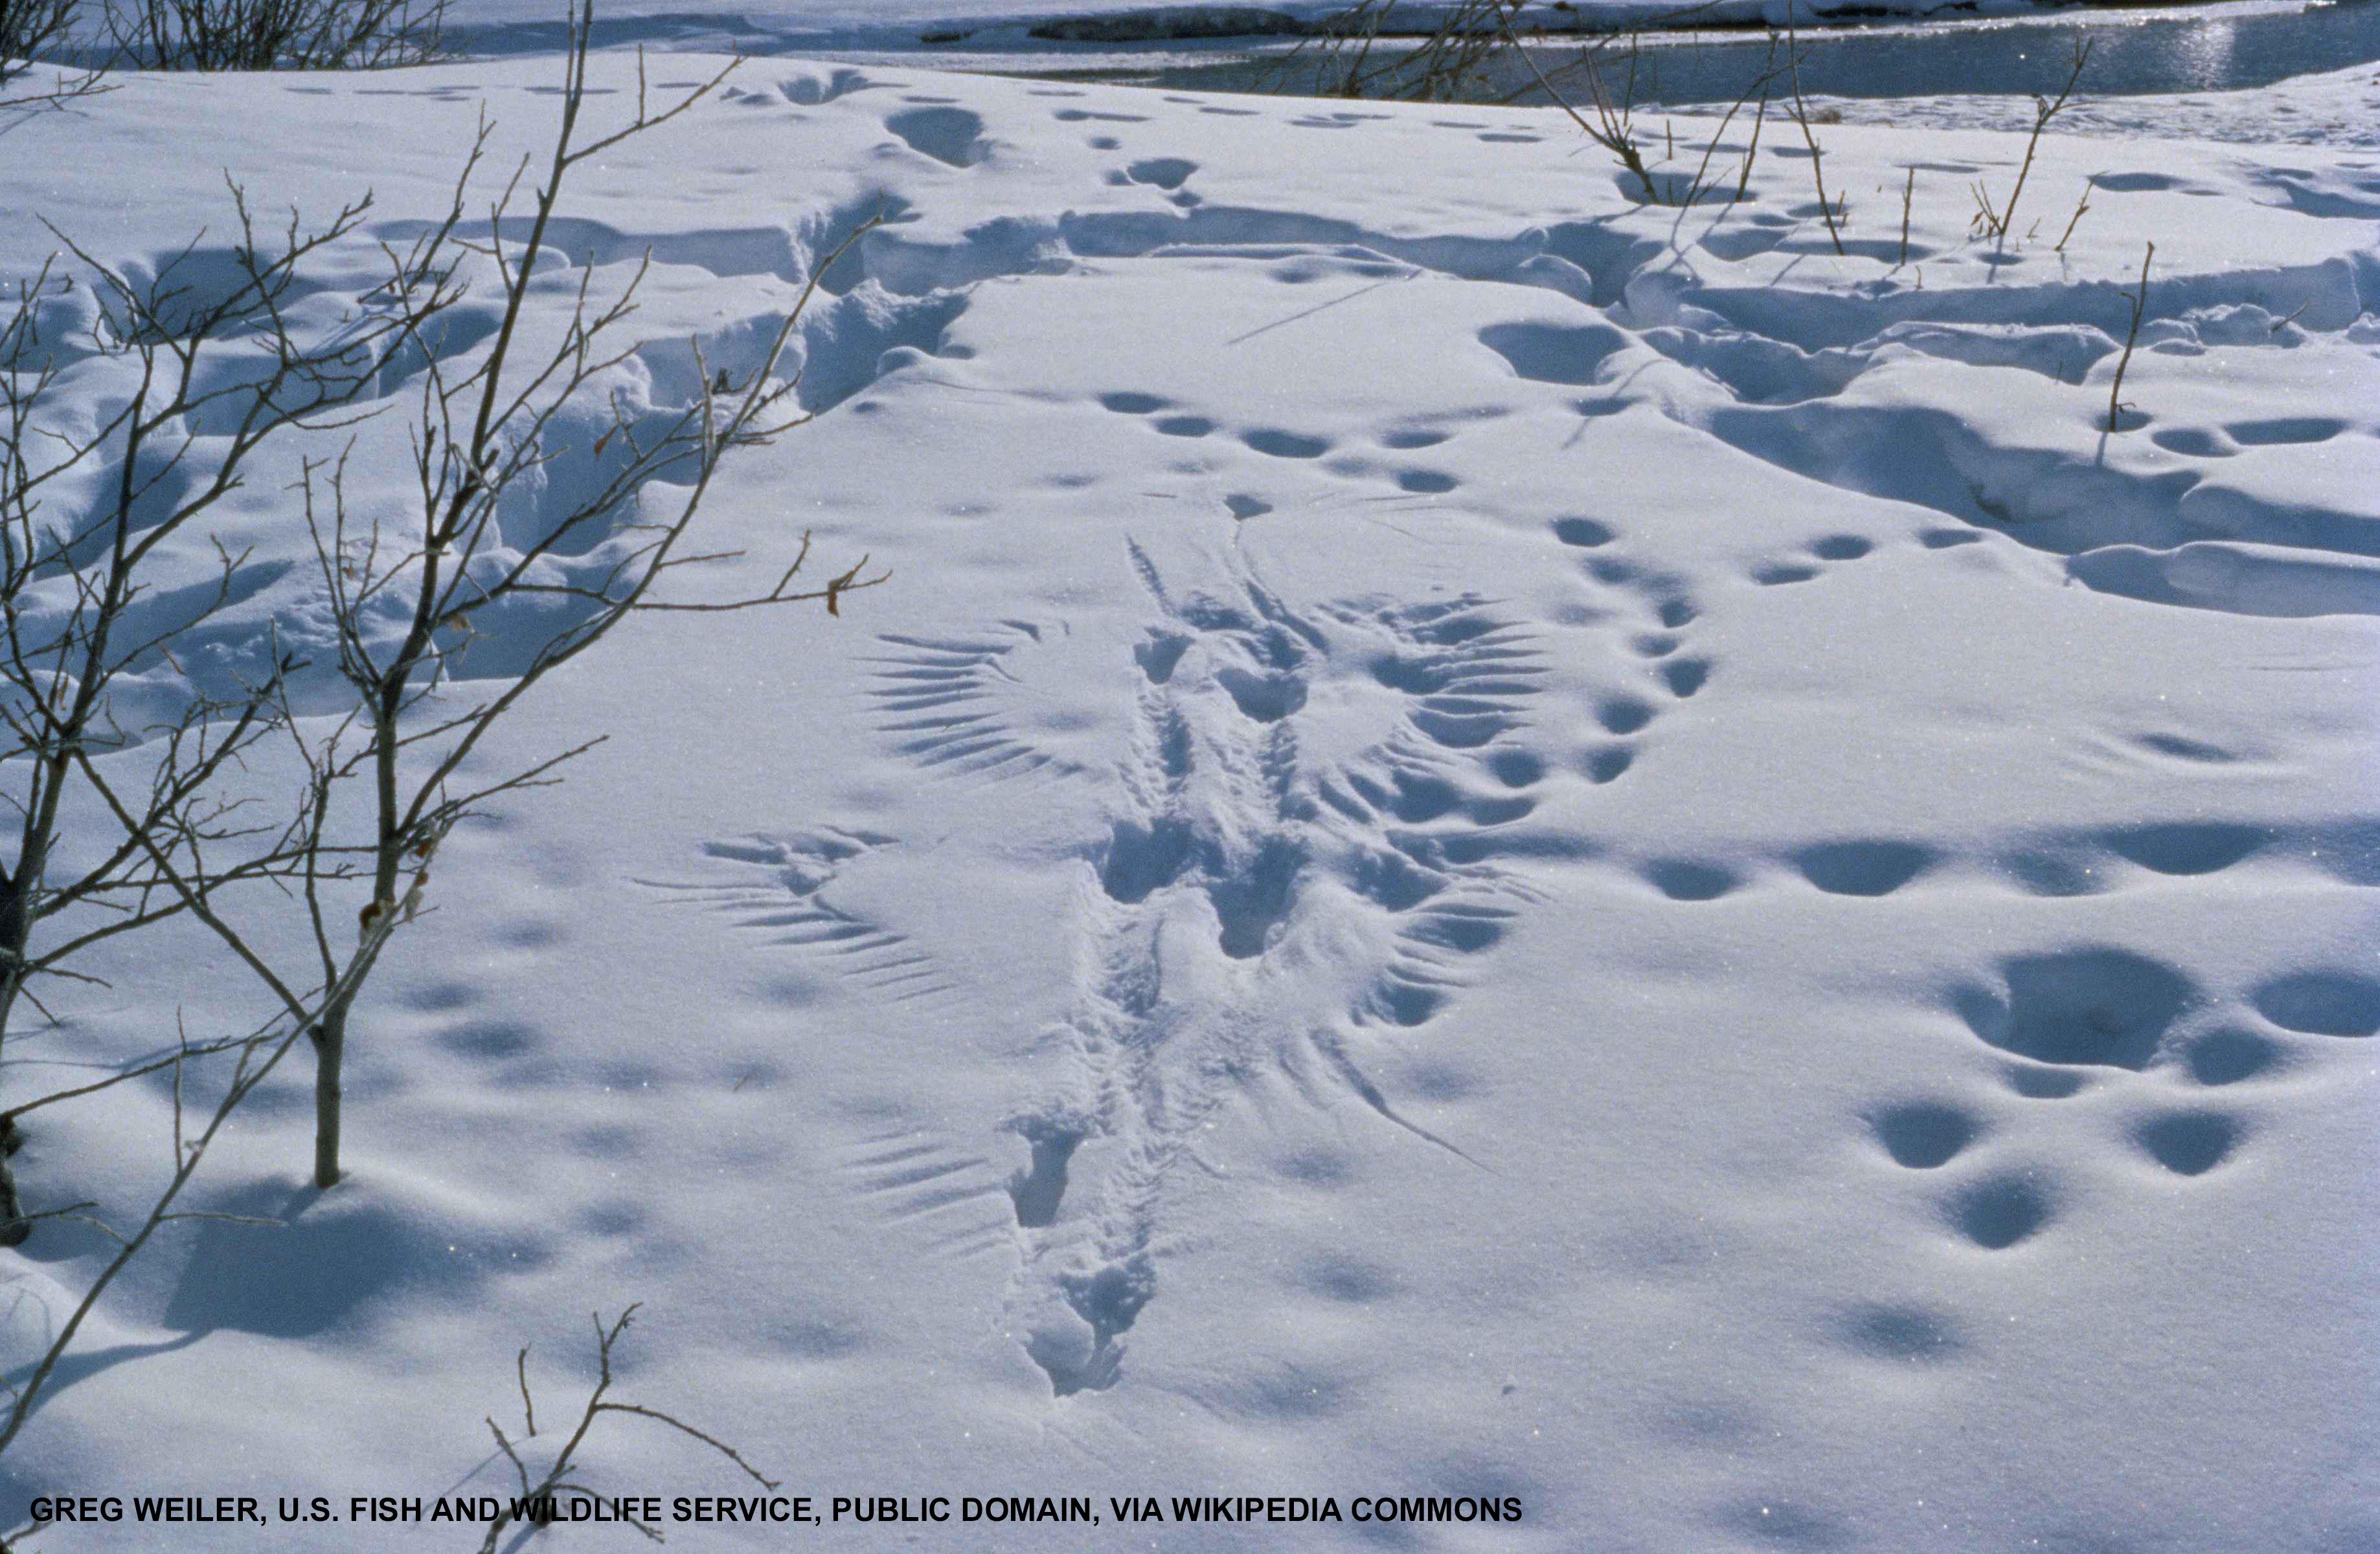 Animal tracks including bird wings in snow